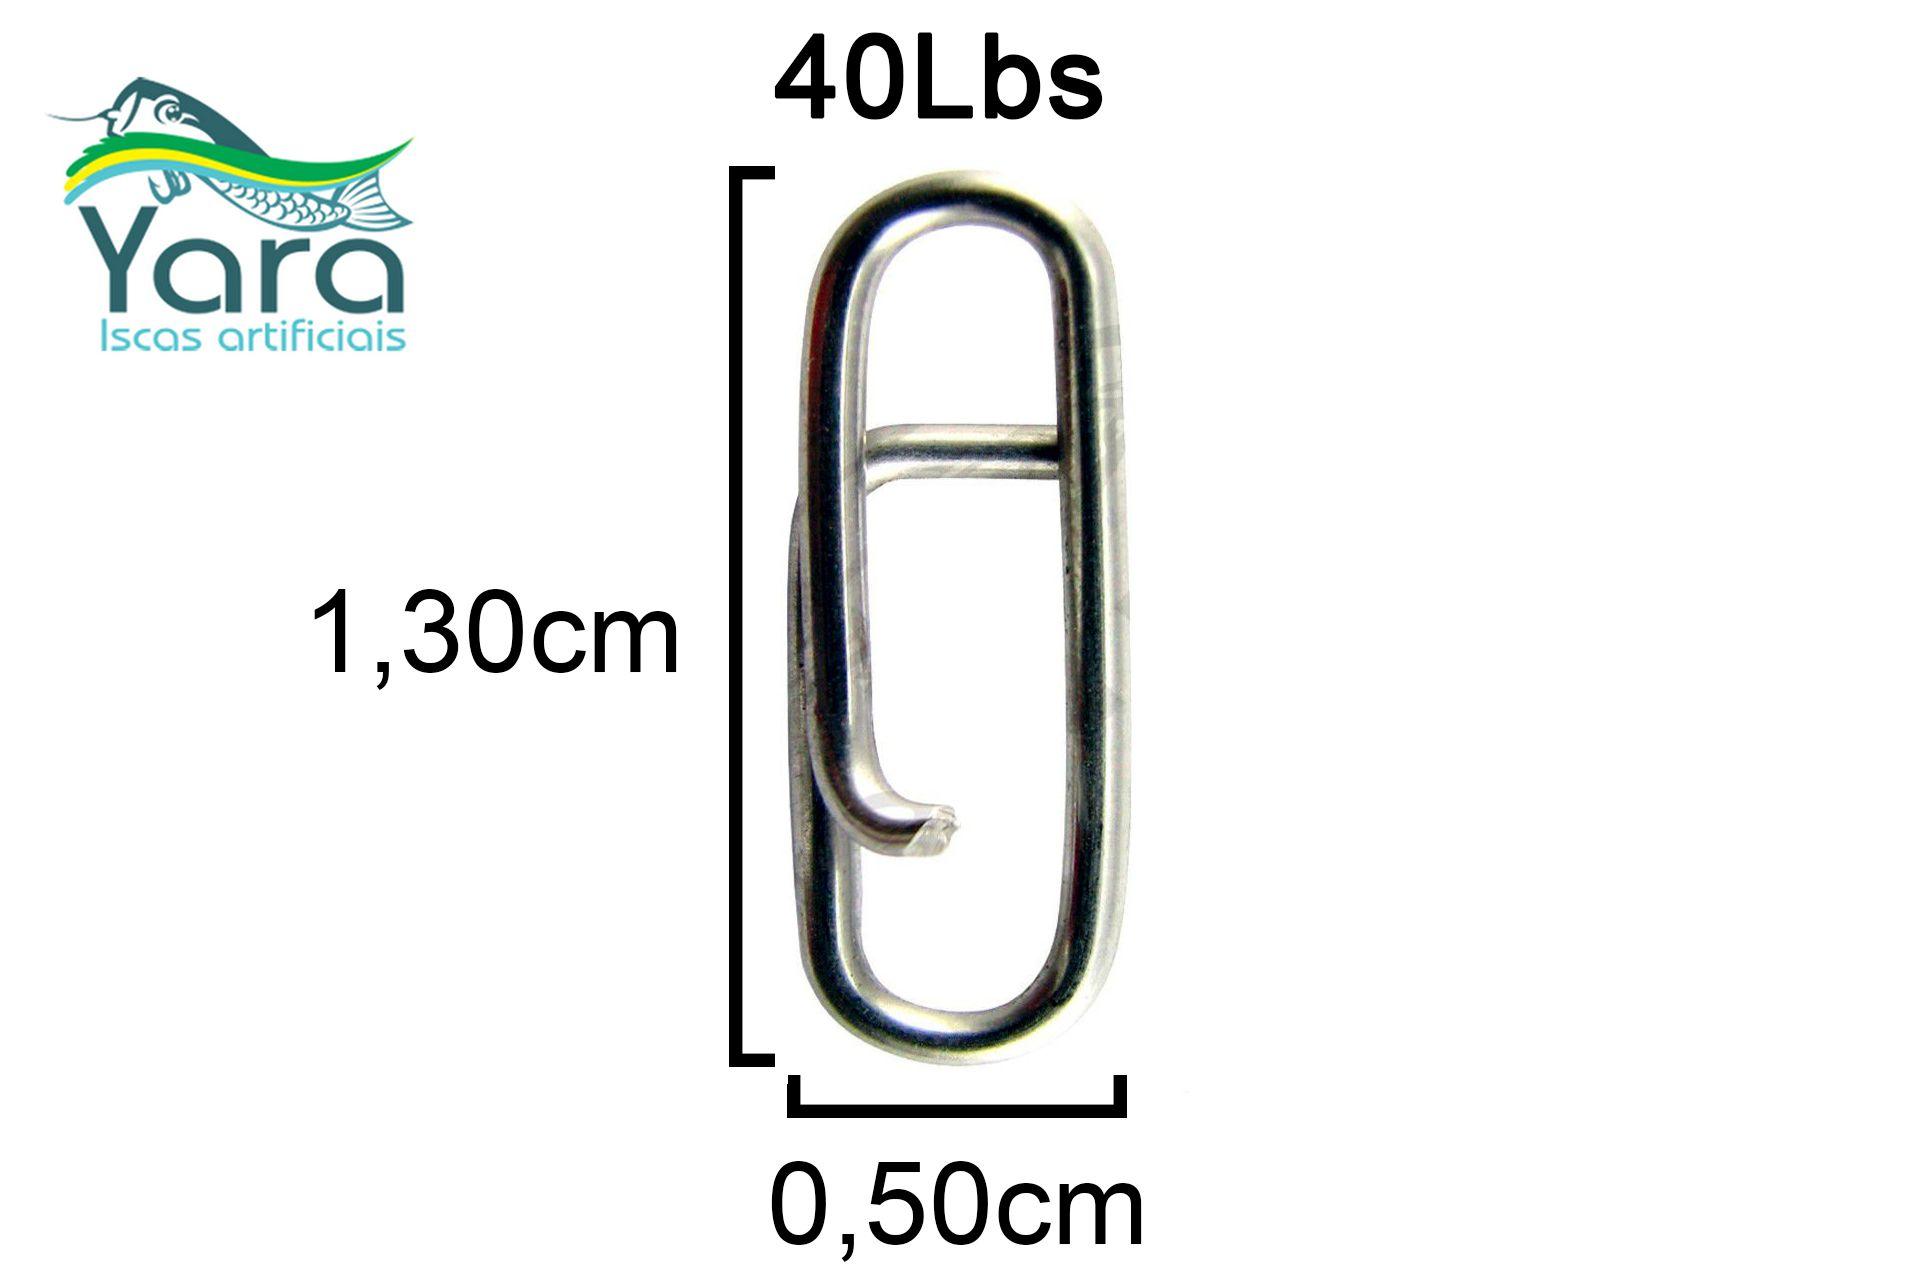 Snap Engate Rápido Yara - 40Lbs - 10 Unidades  - Life Pesca - Sua loja de Pesca, Camping e Lazer